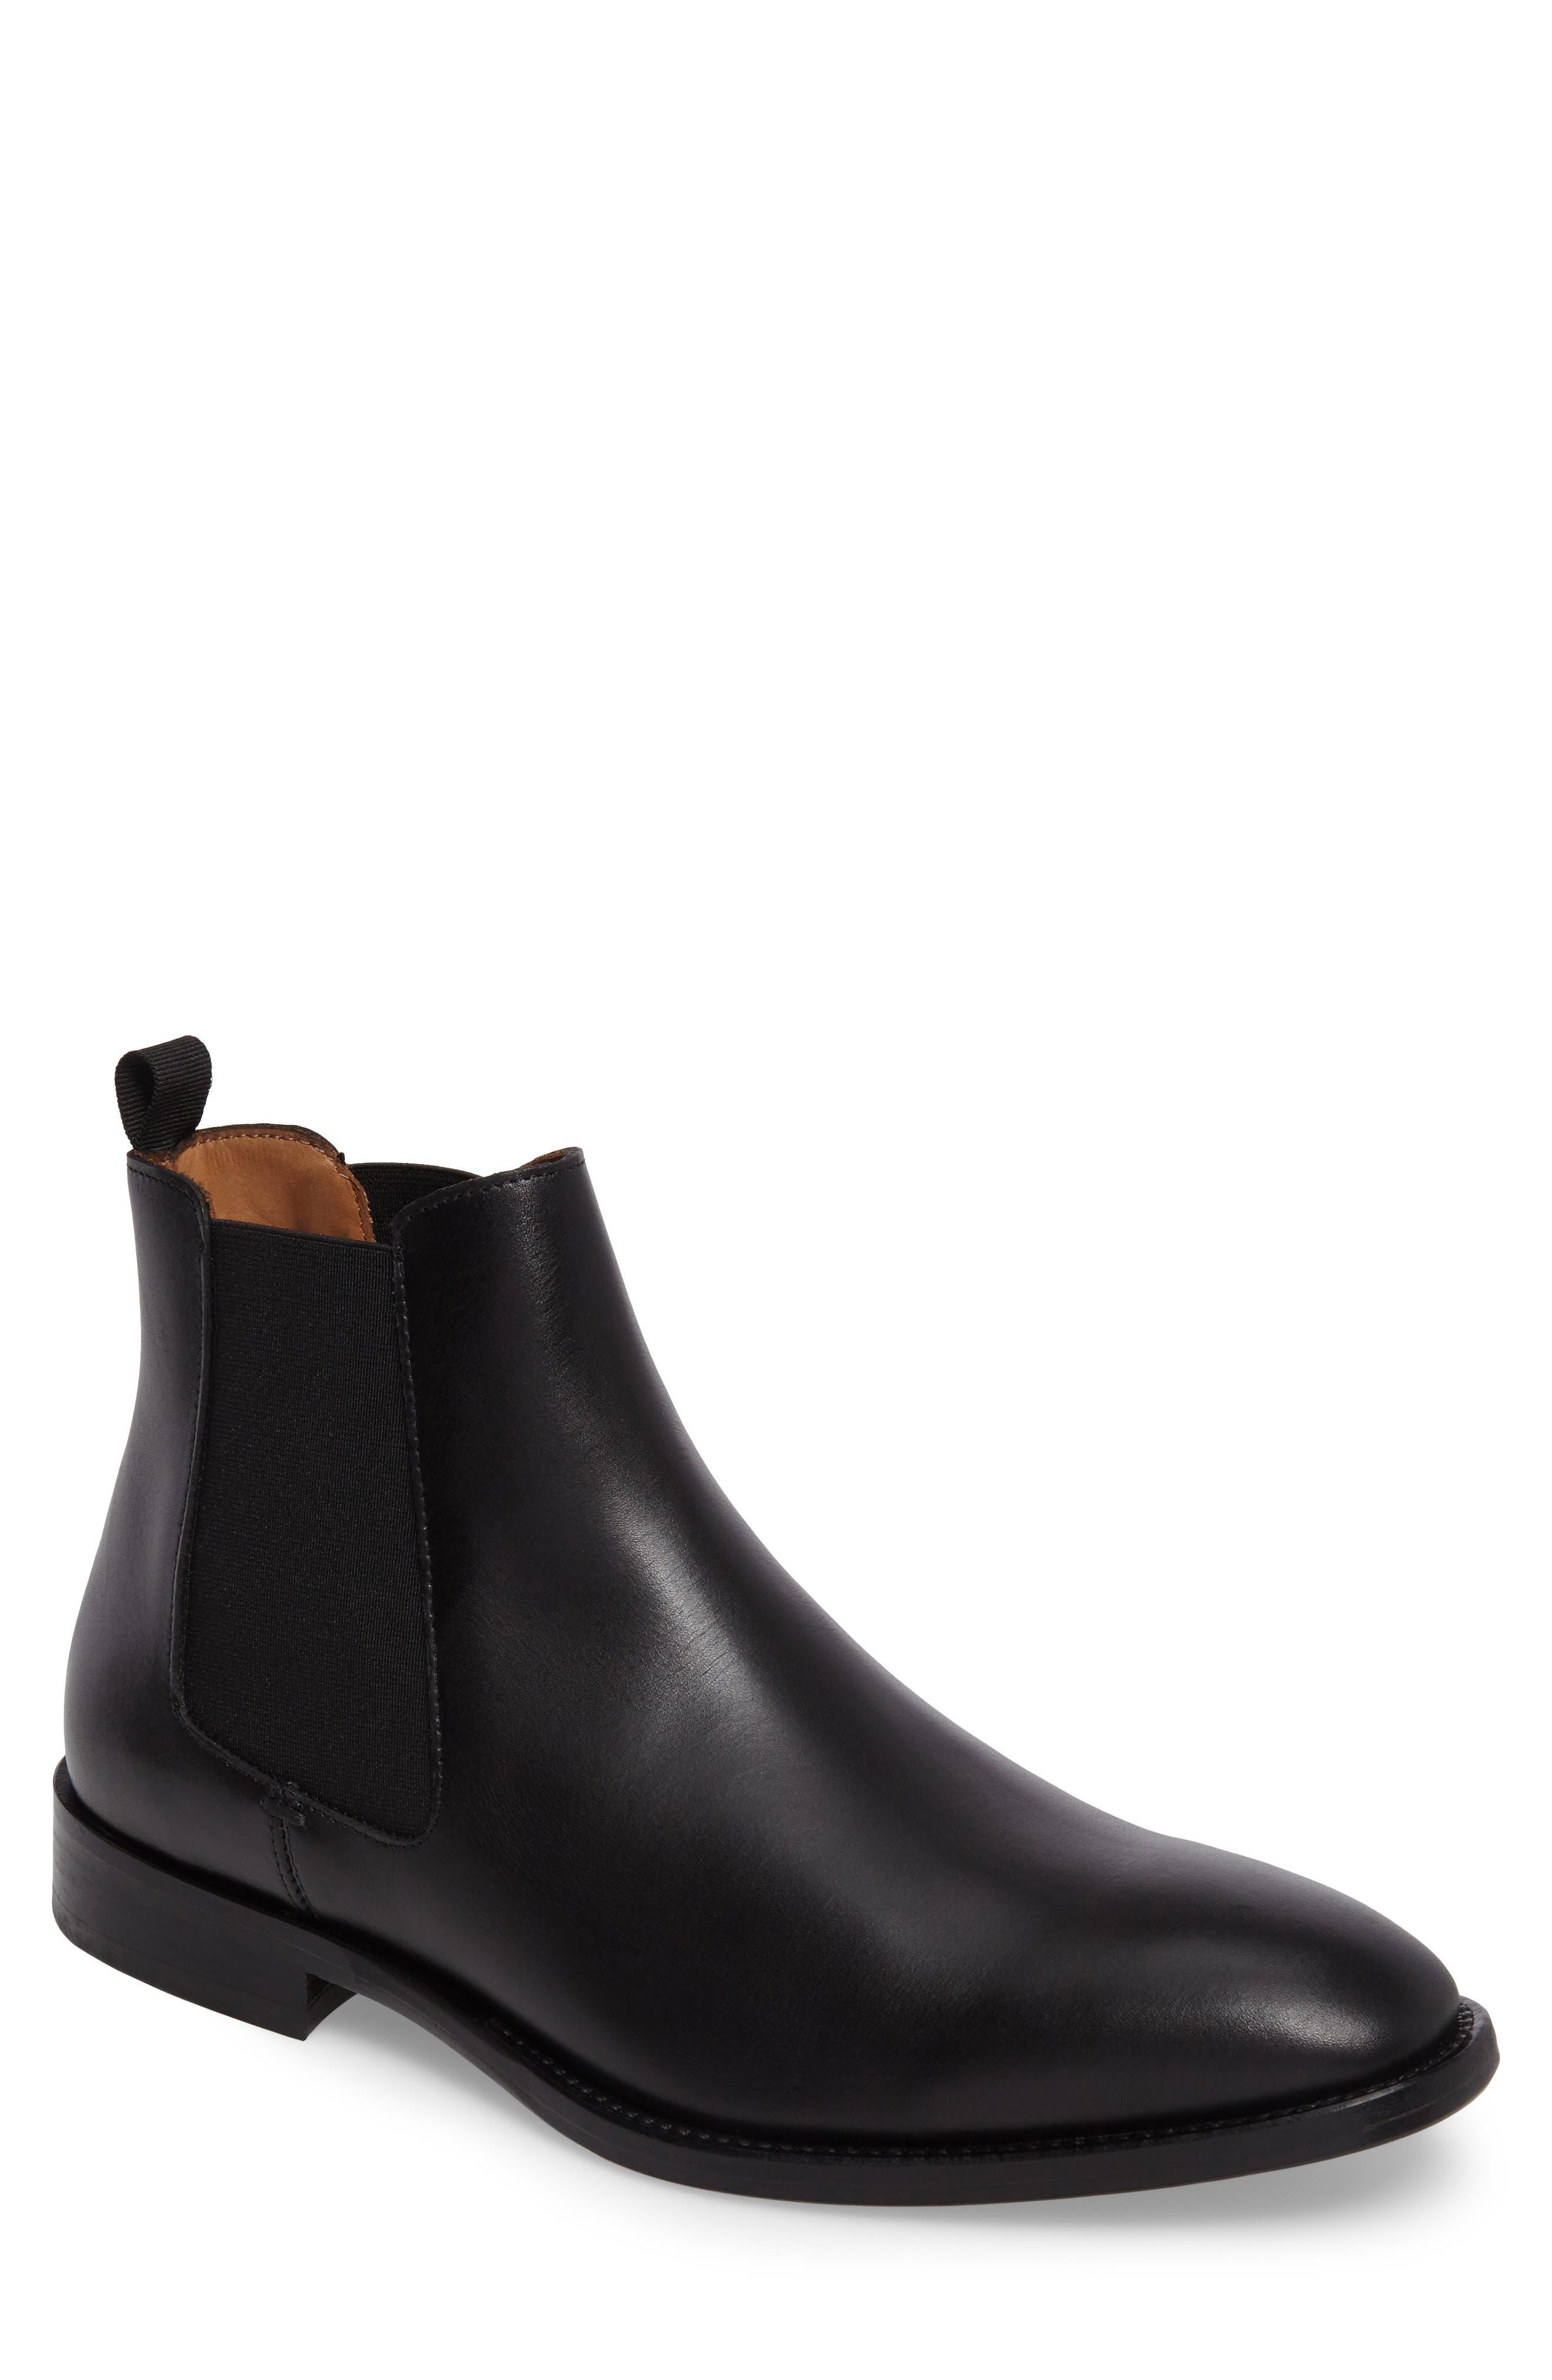 Haldien Chelsea Boot,                             Main thumbnail 1, color,                             Black Leather/ Elastic